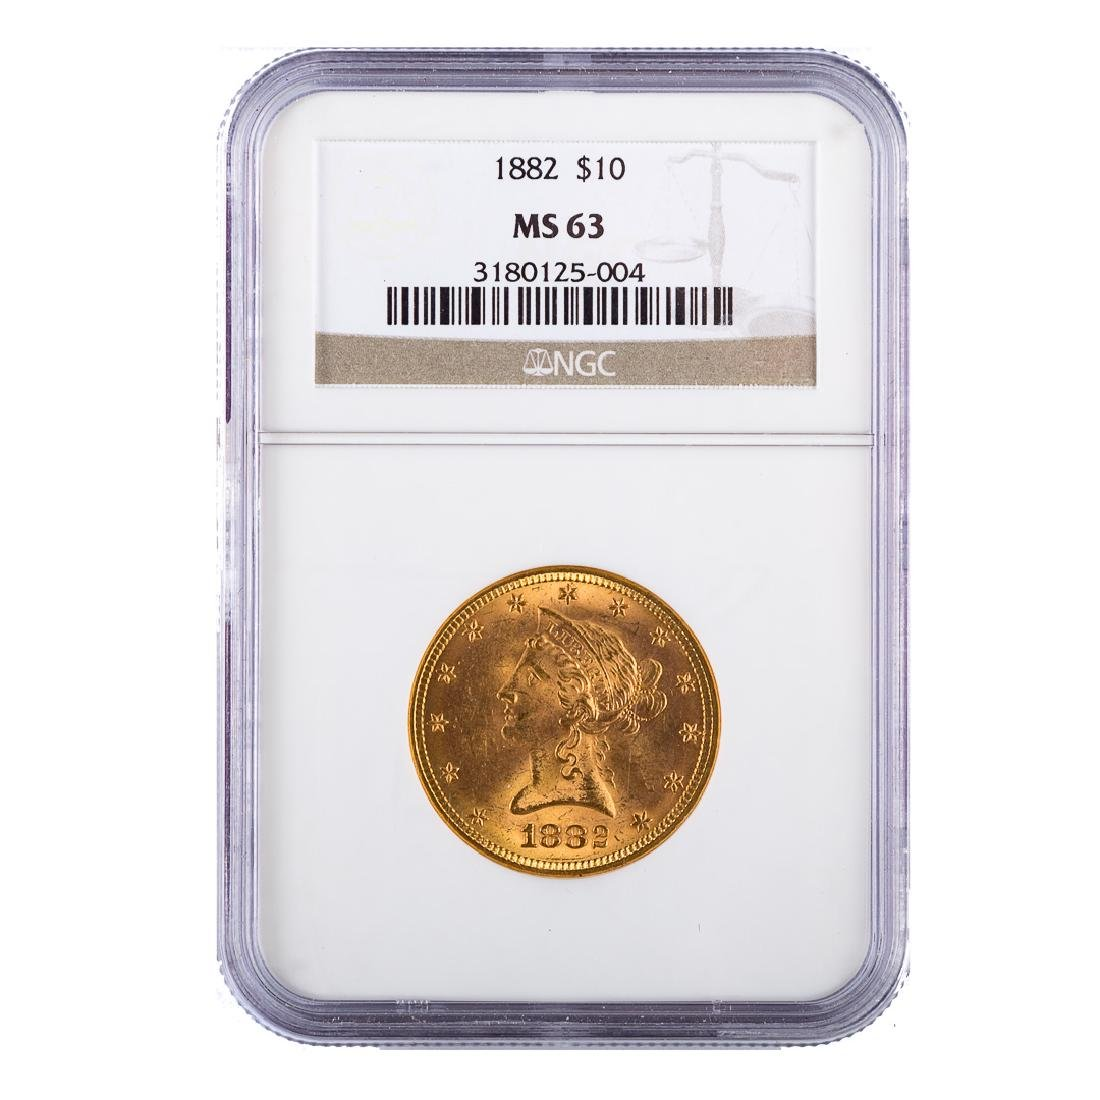 [US] 1882 $10 Liberty Gold eagle NGC MS63